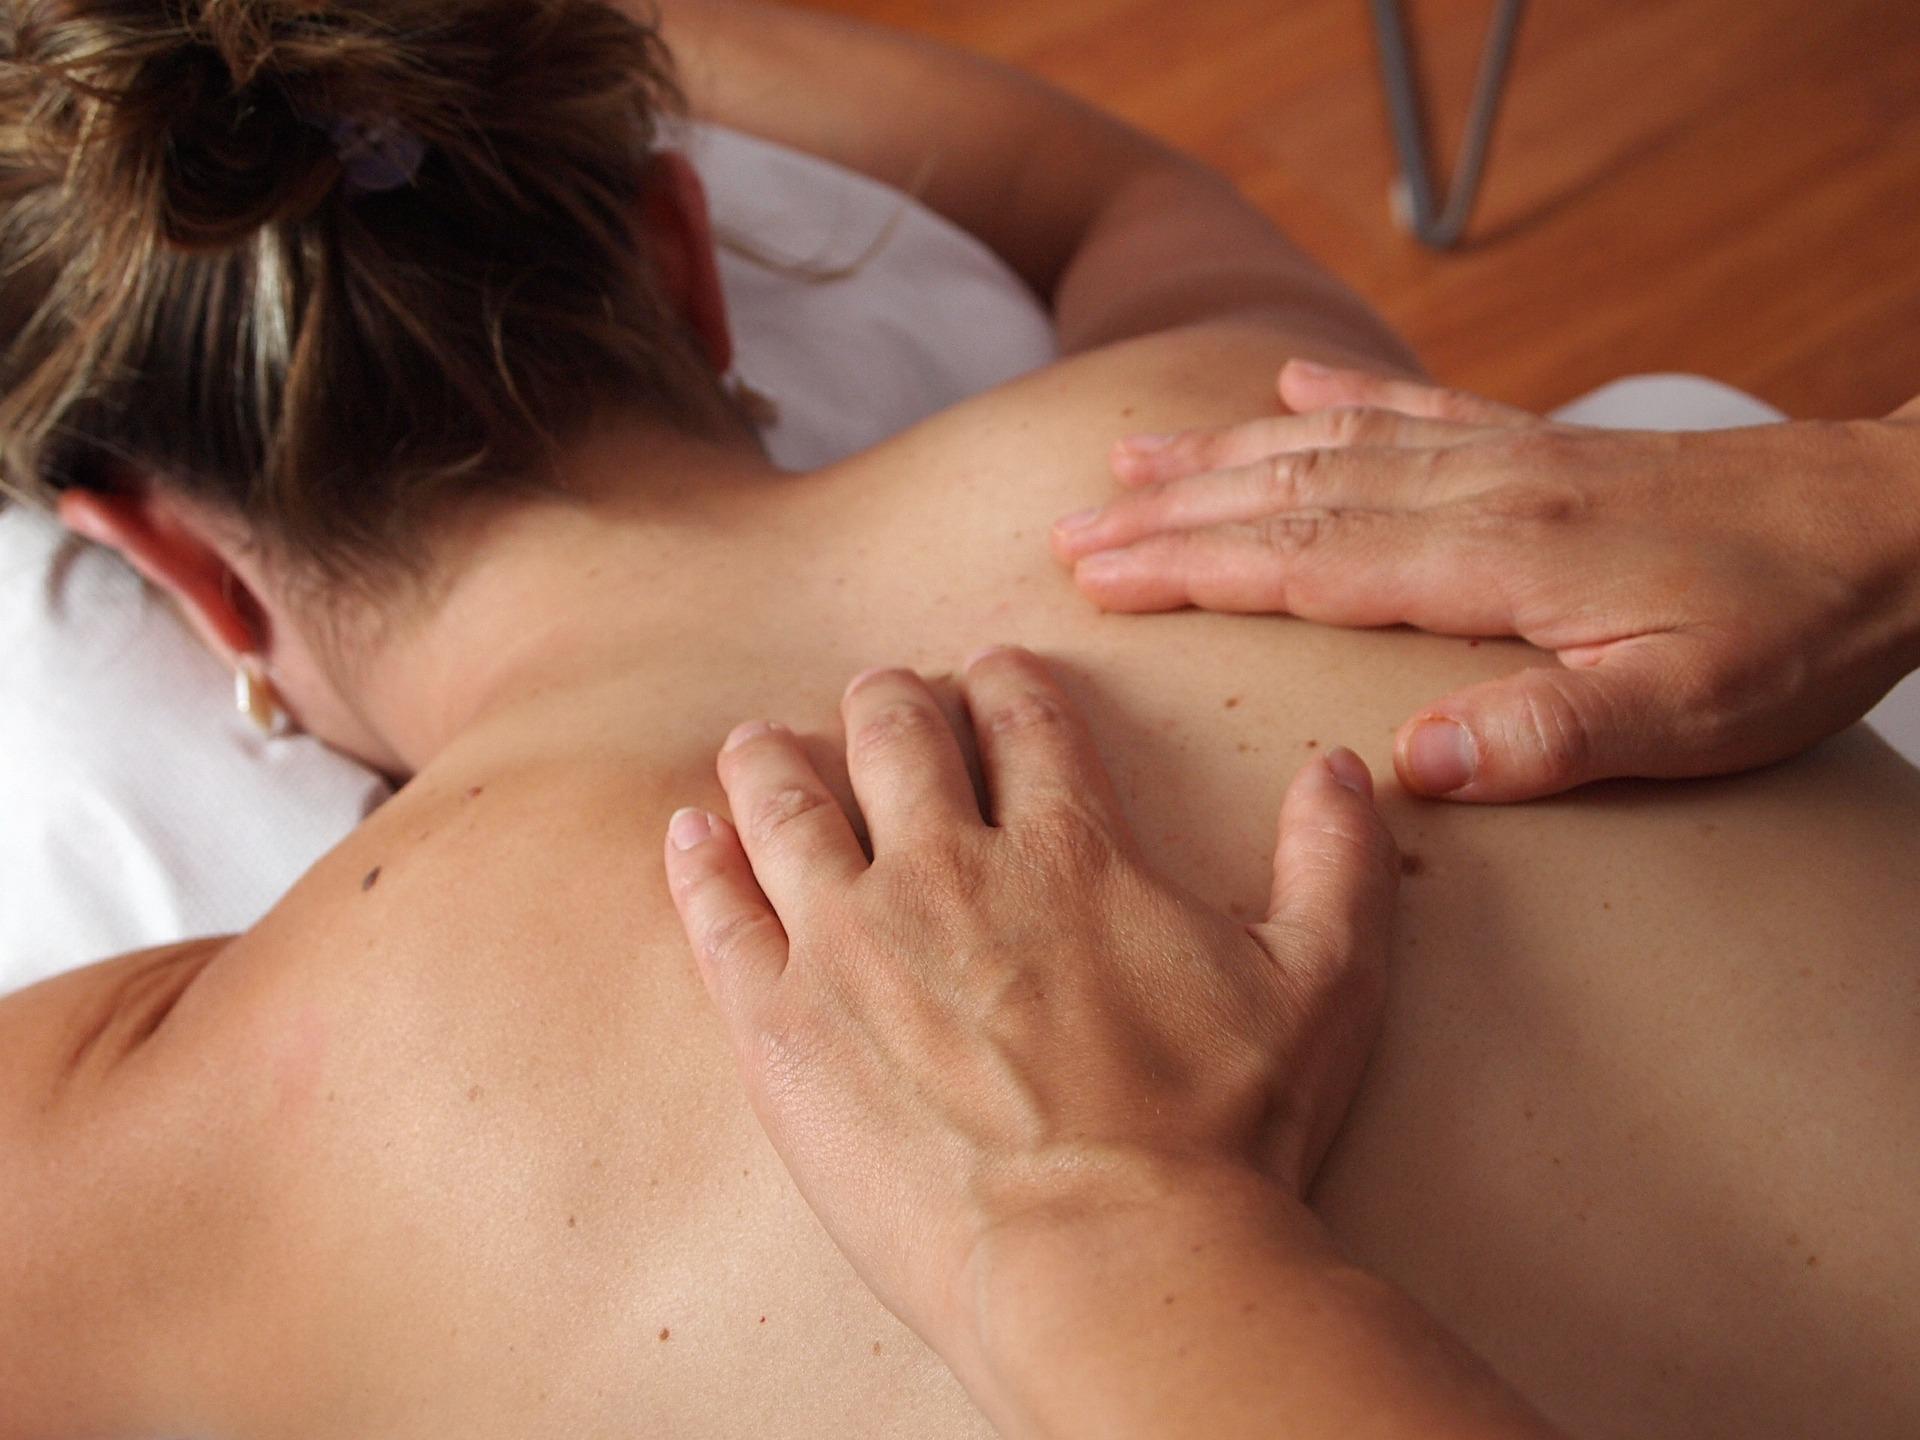 Fibromyalgie: Symptome, Diagnose und Therapie 2